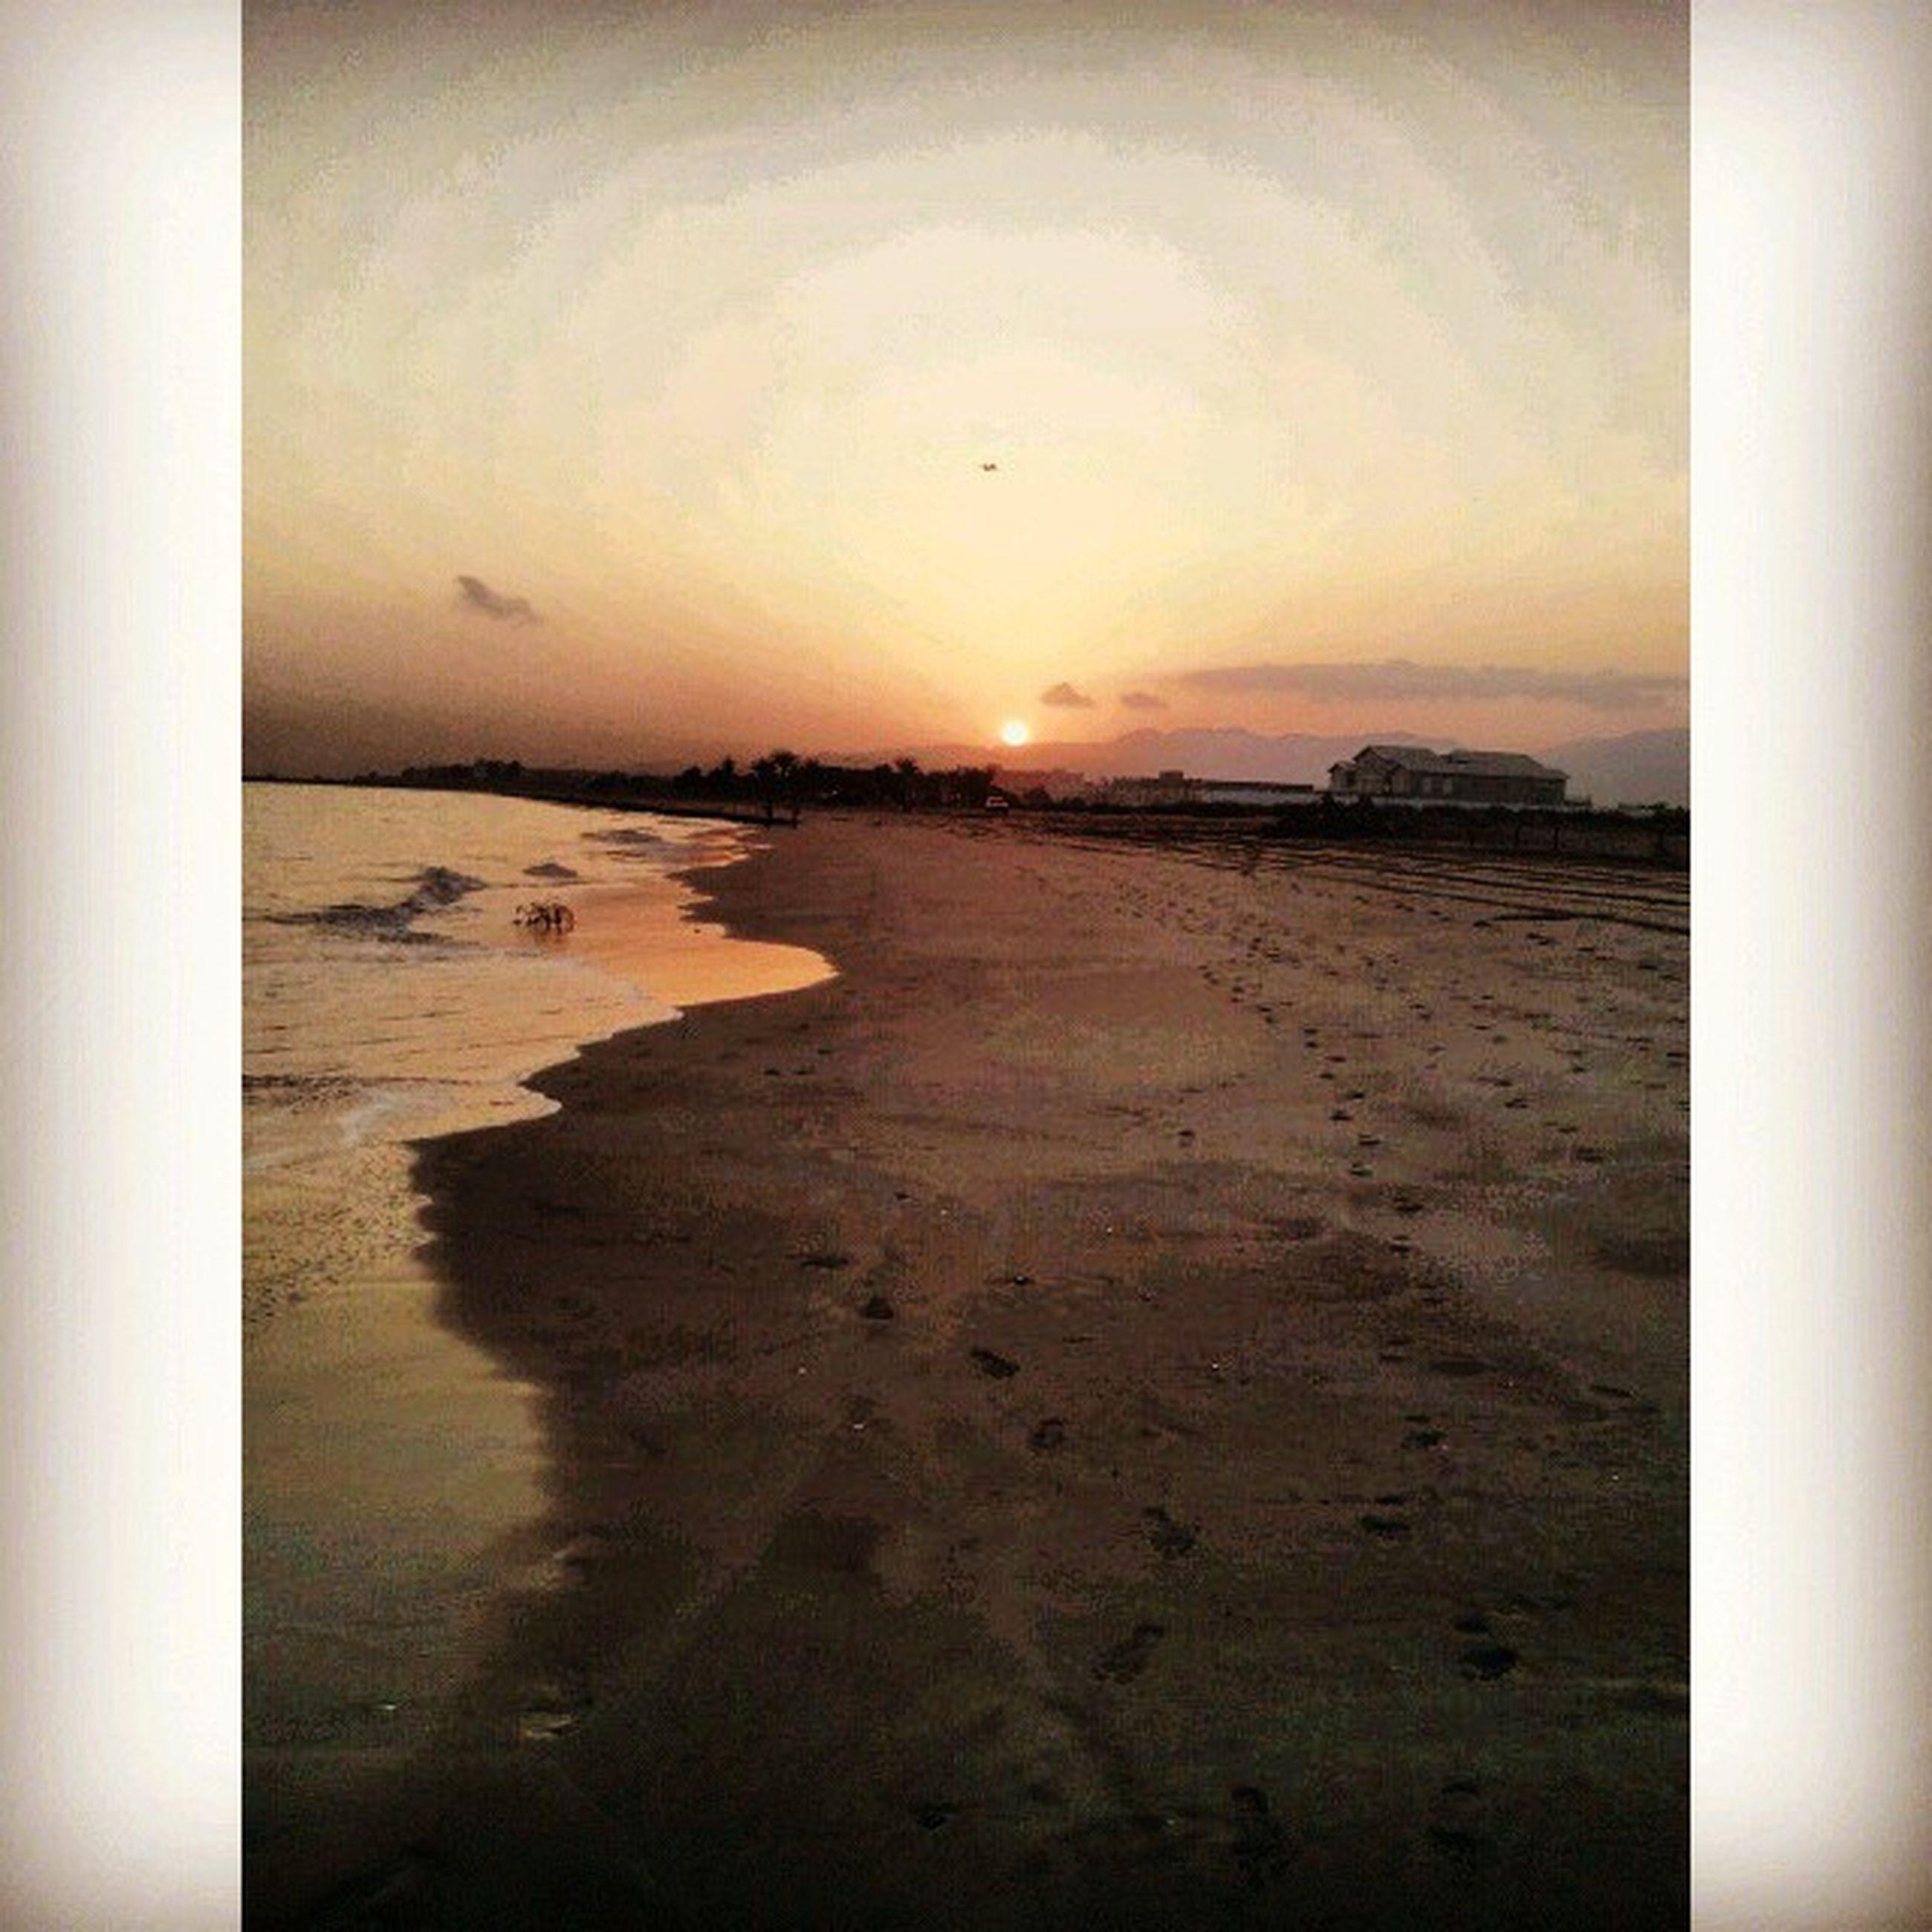 sea, sunset, beach, horizon over water, water, shore, sand, scenics, tranquil scene, tranquility, beauty in nature, sun, sky, orange color, nature, idyllic, wave, sunlight, coastline, transfer print